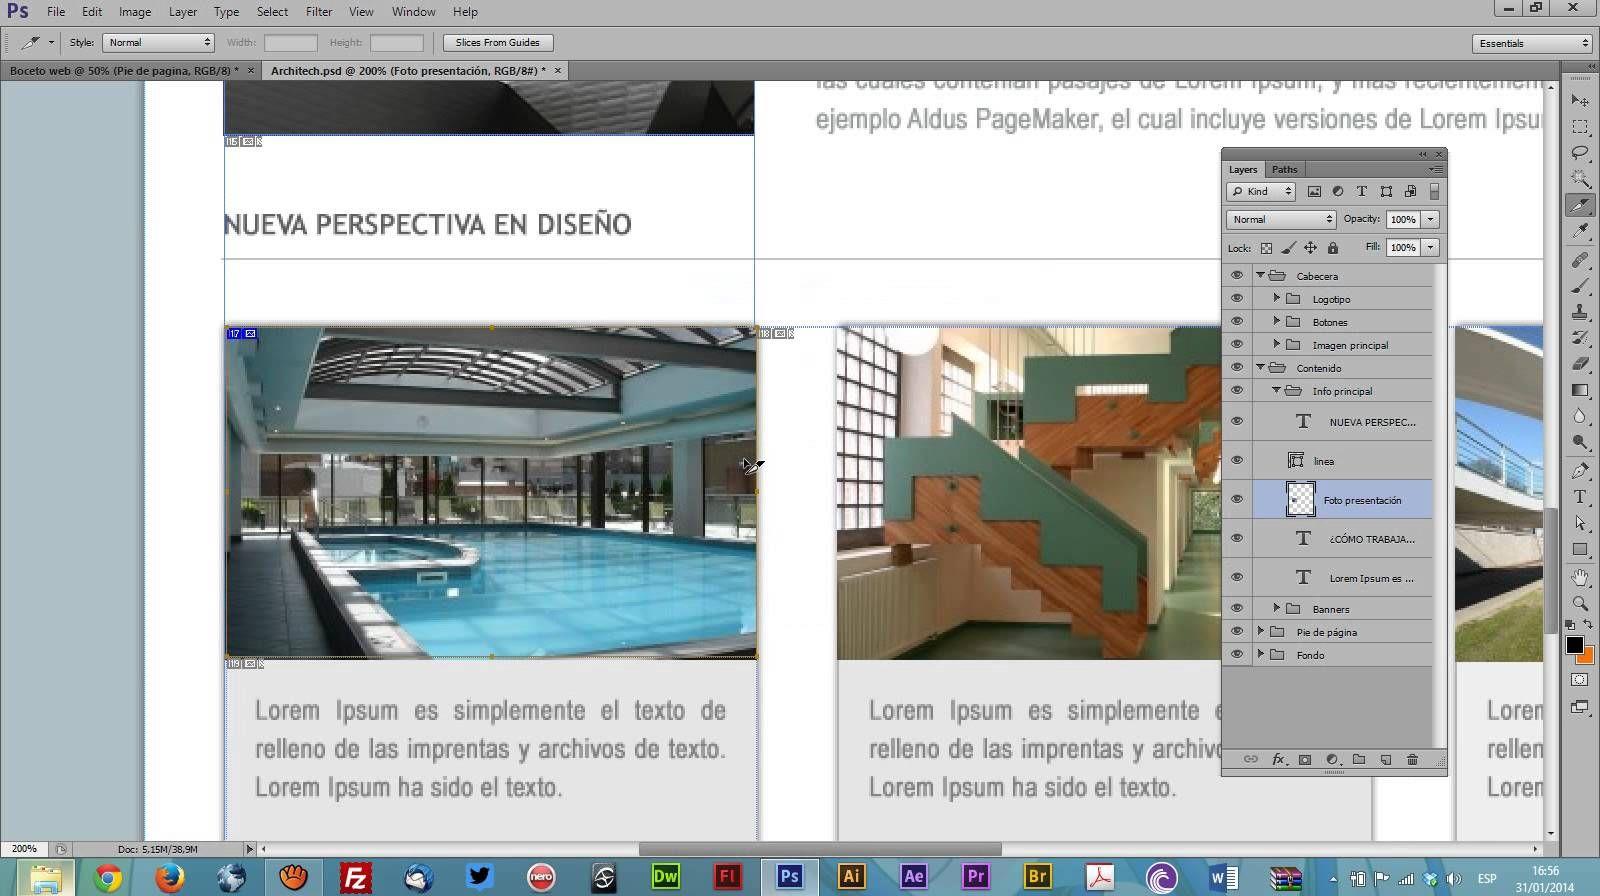 Crea tu pagina web - Boceto web # 1 | Diseño Web